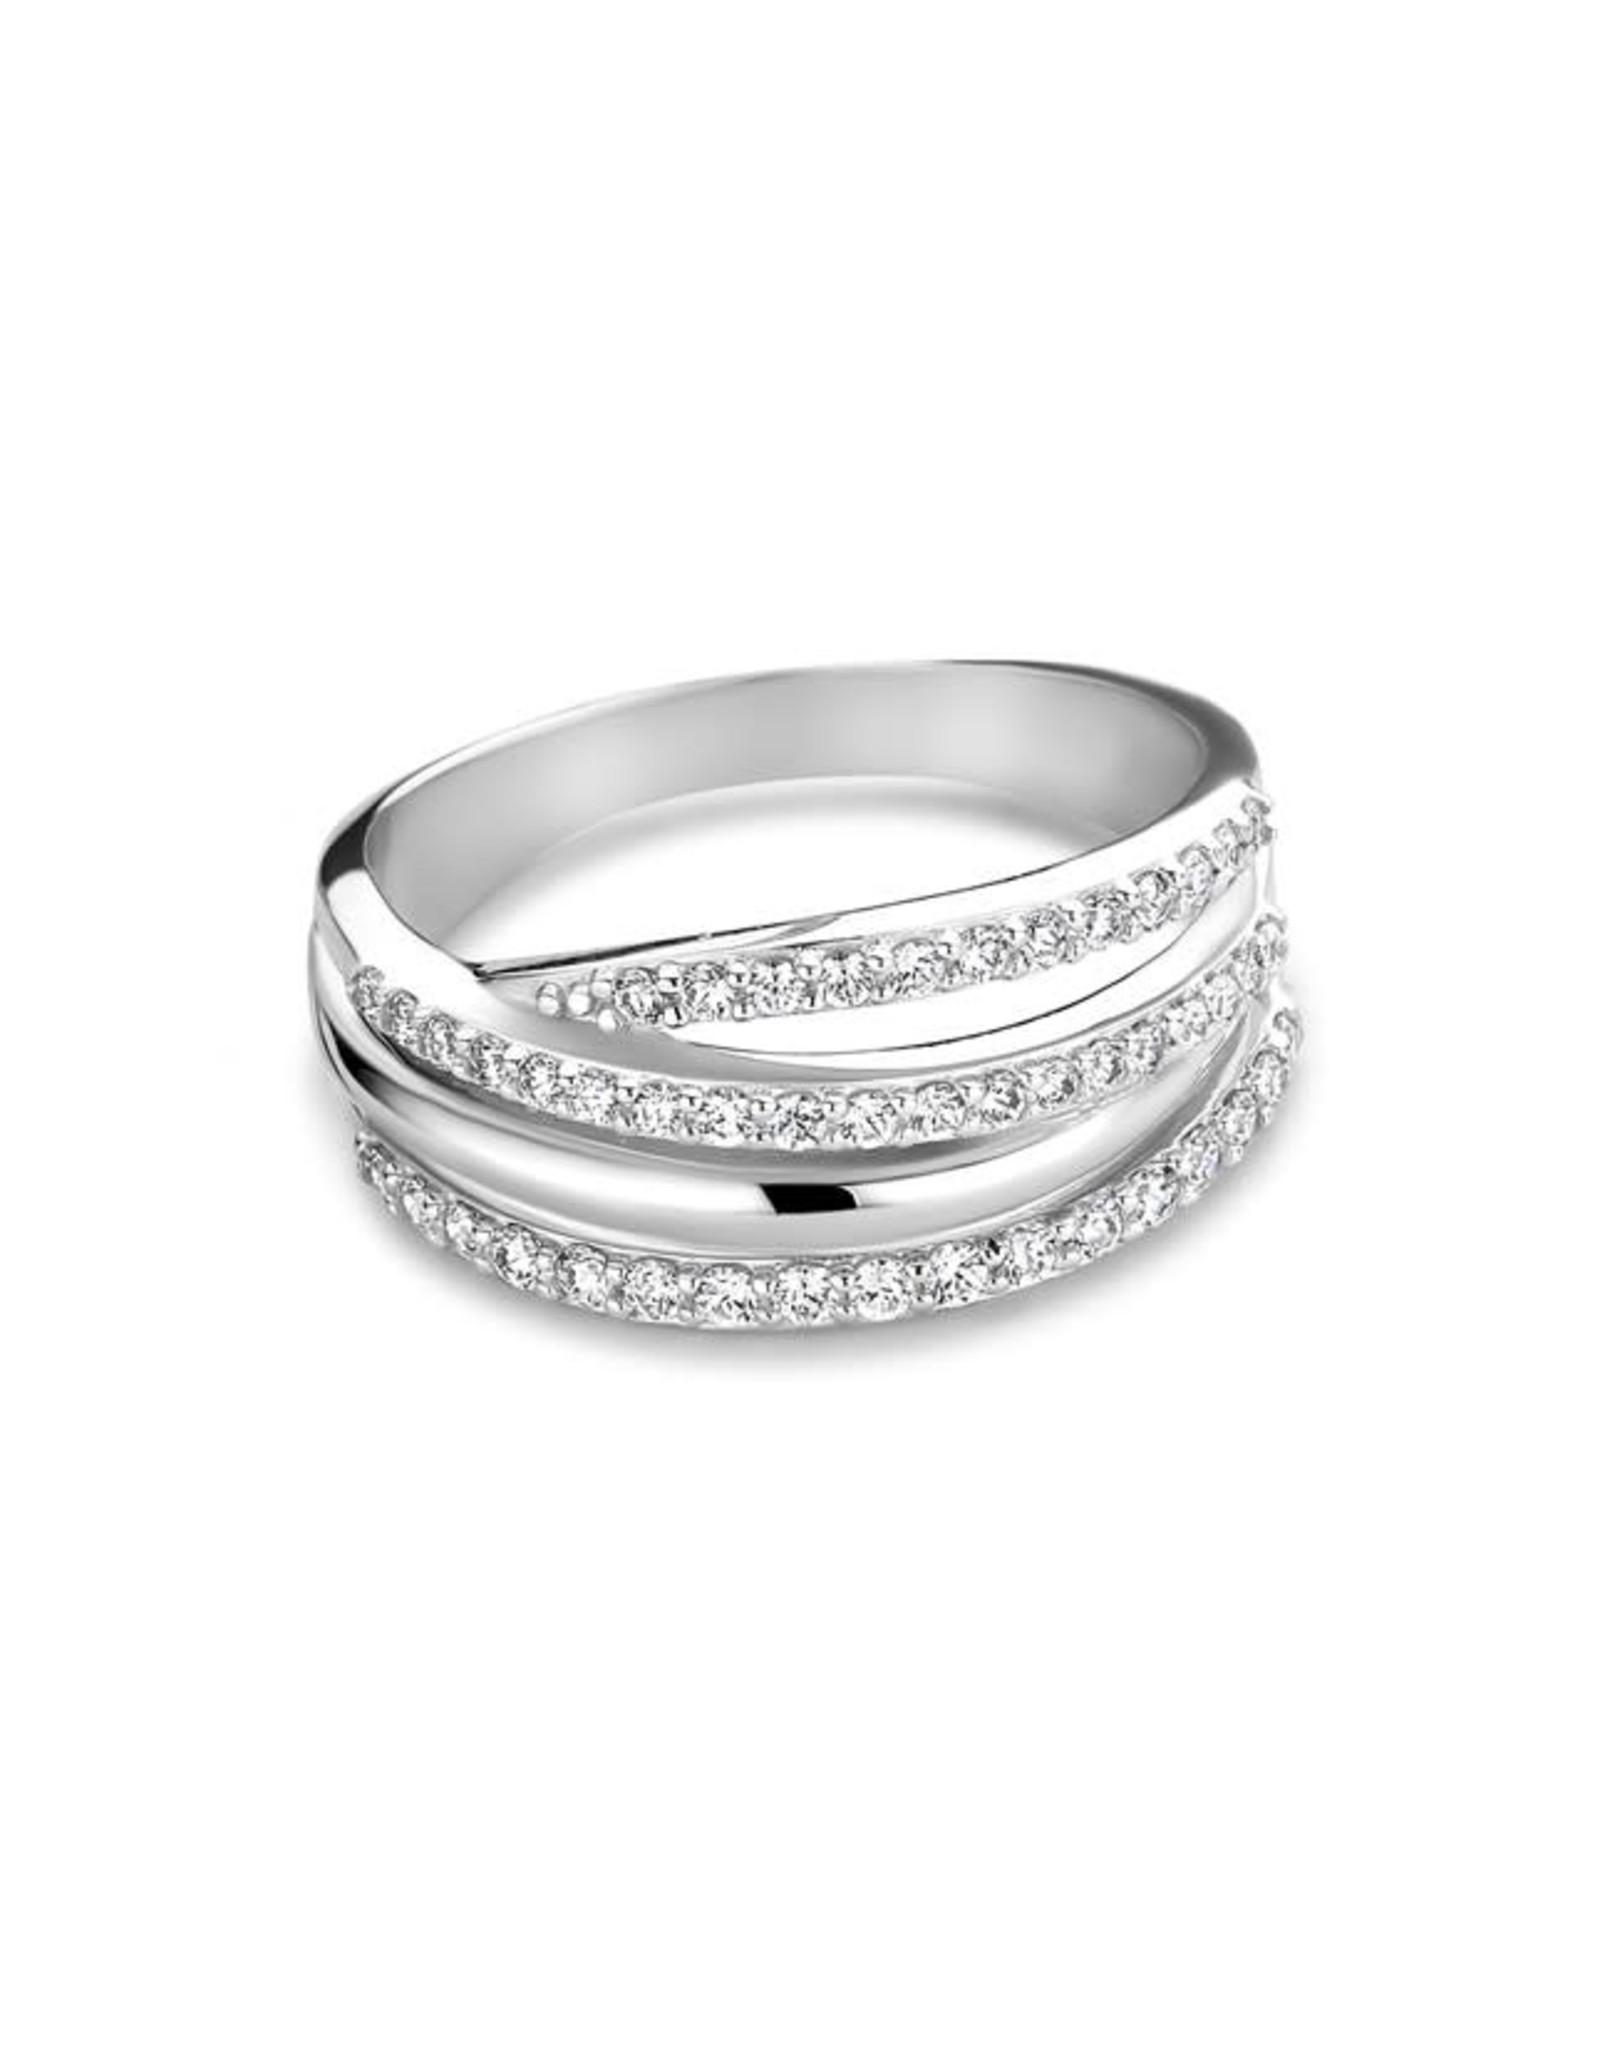 Ring Wit Goud GR42221WZ Zirkonium